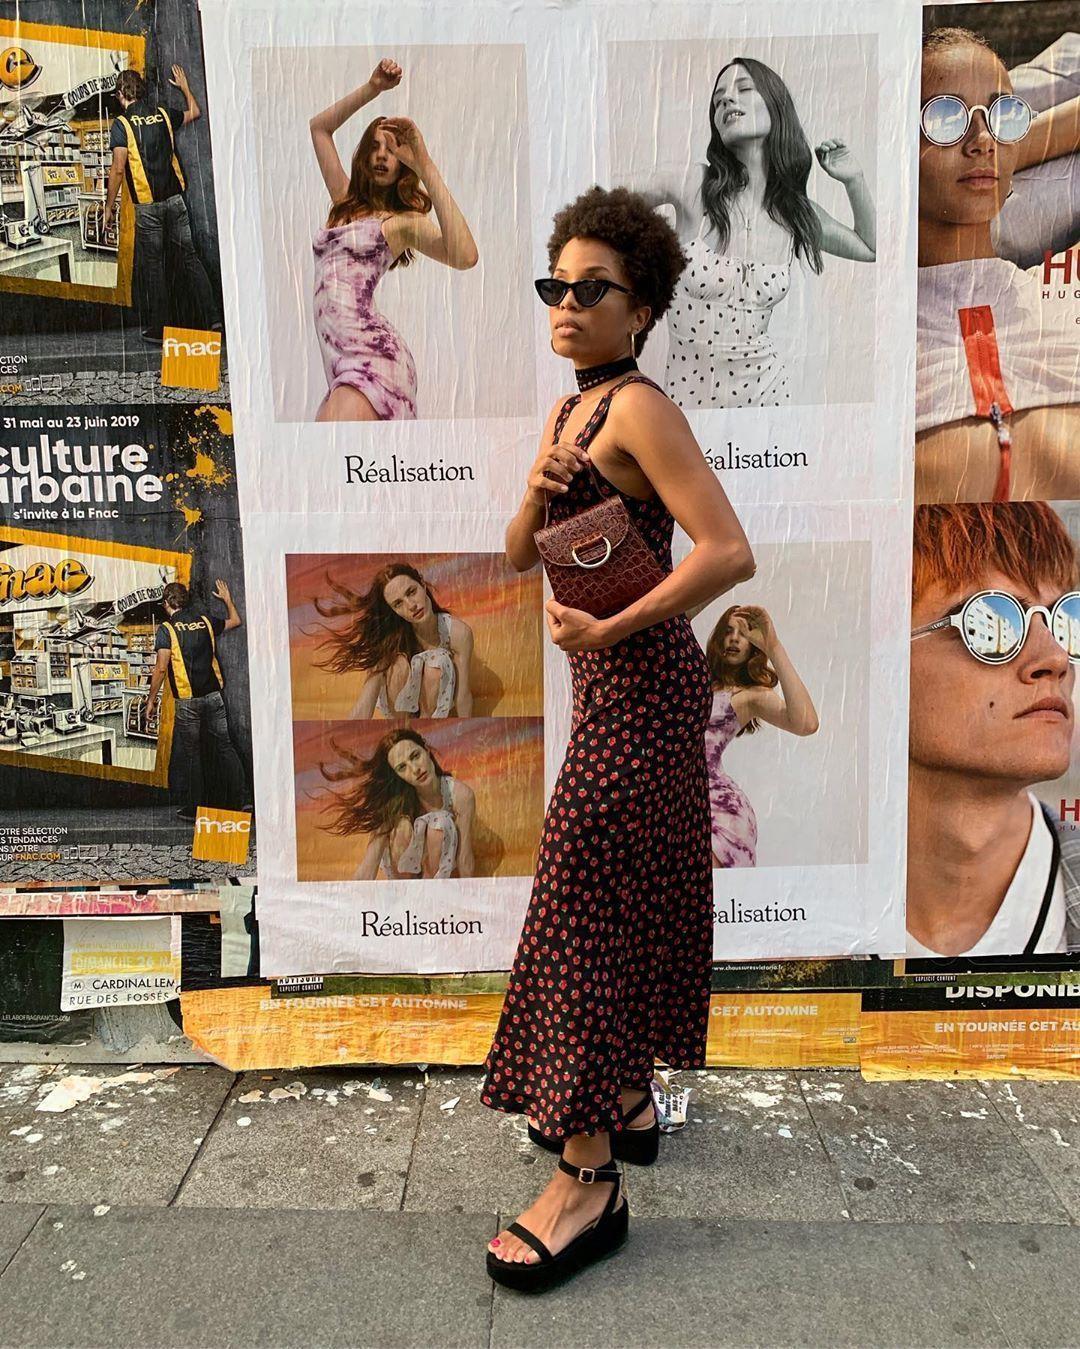 Get the dress for $245 at realisationpar.com – Wheretoget